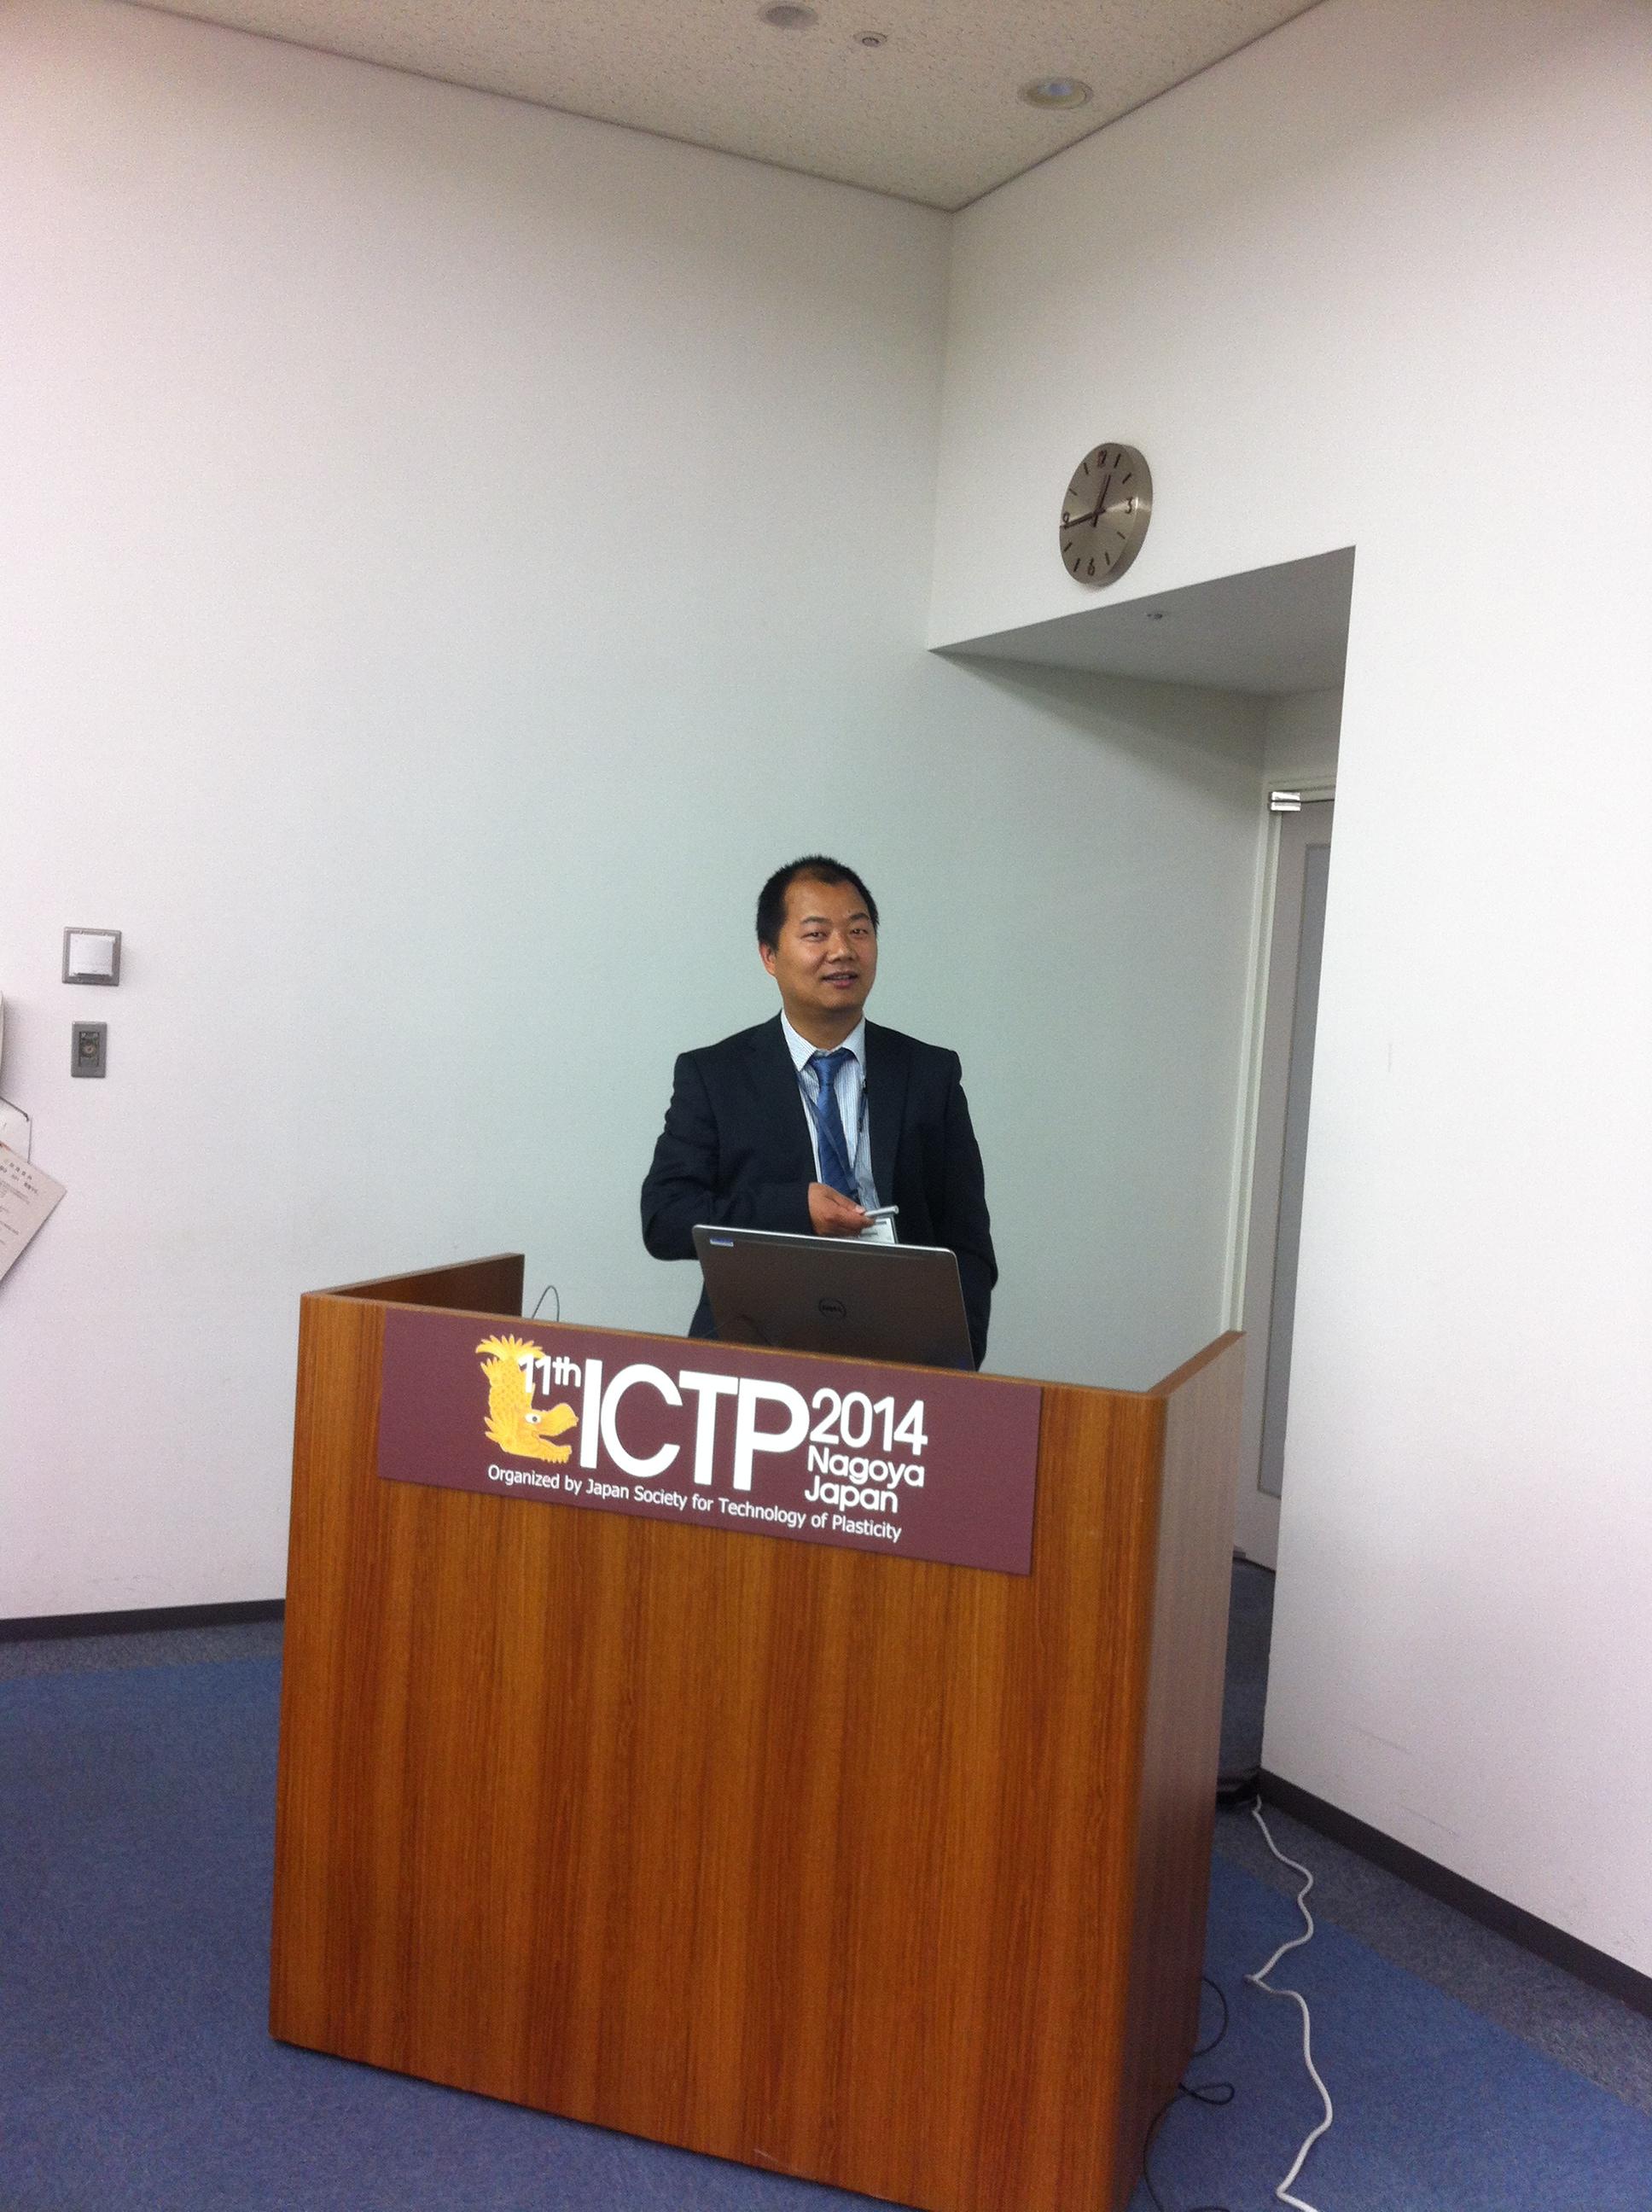 Dr. Hailiang Yu, Vice-Chancellor's Research Fellow, University of Wollongong